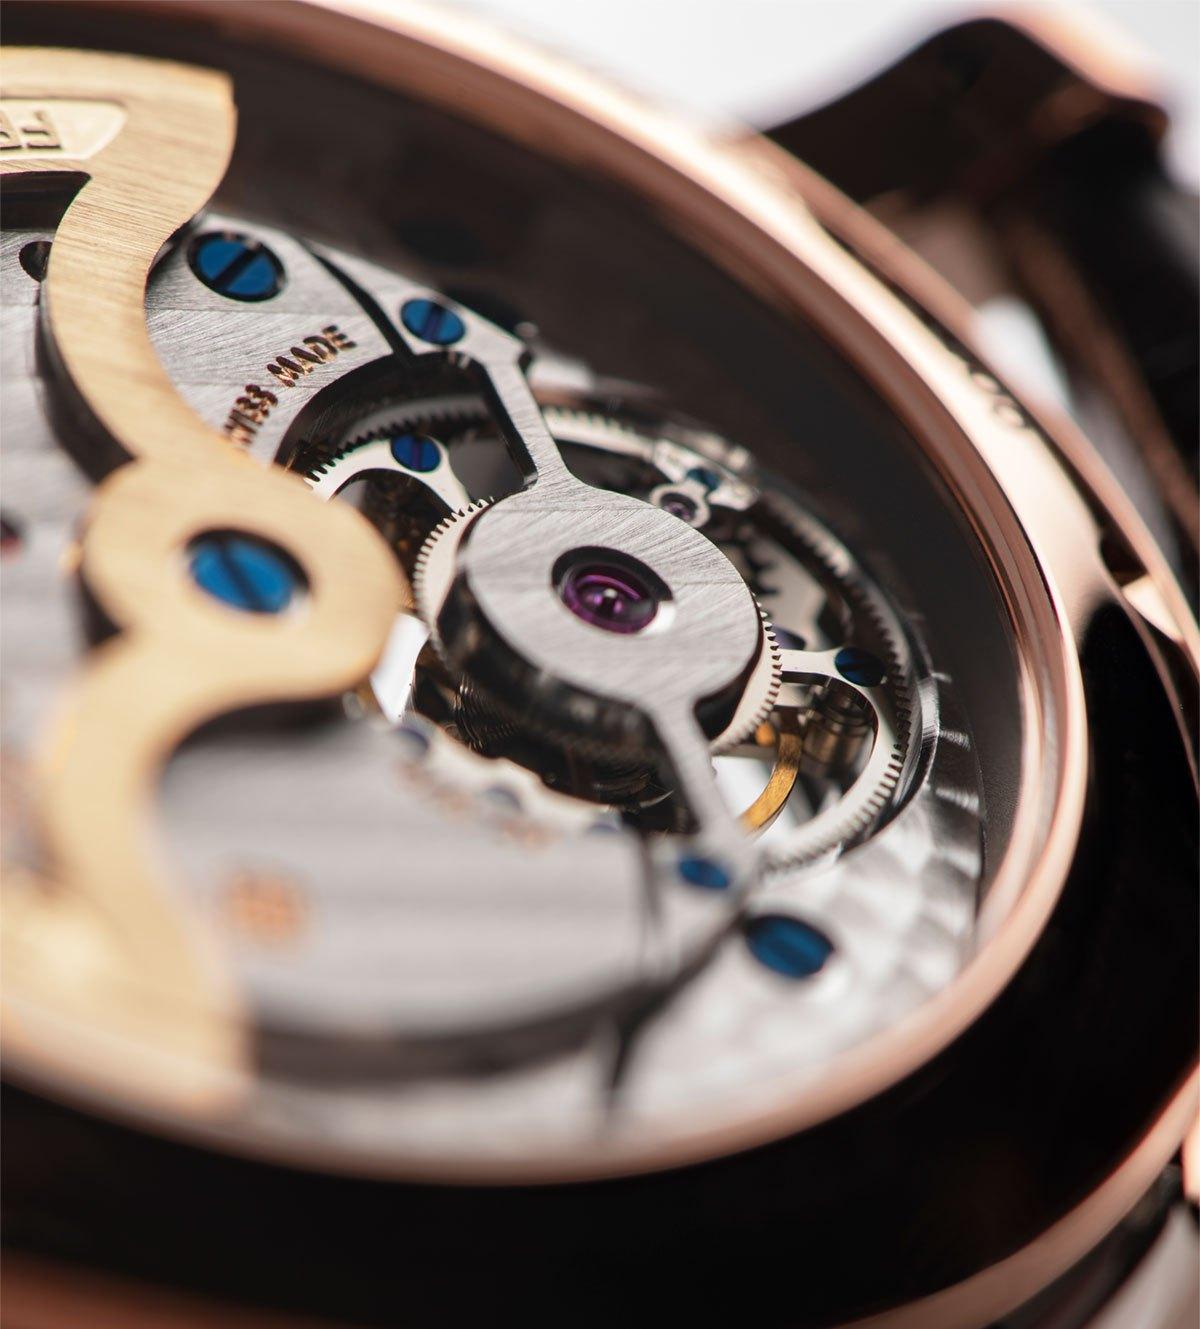 frederique-constant-perpetual-calendar-tourbillon-manufacture-11.jpg